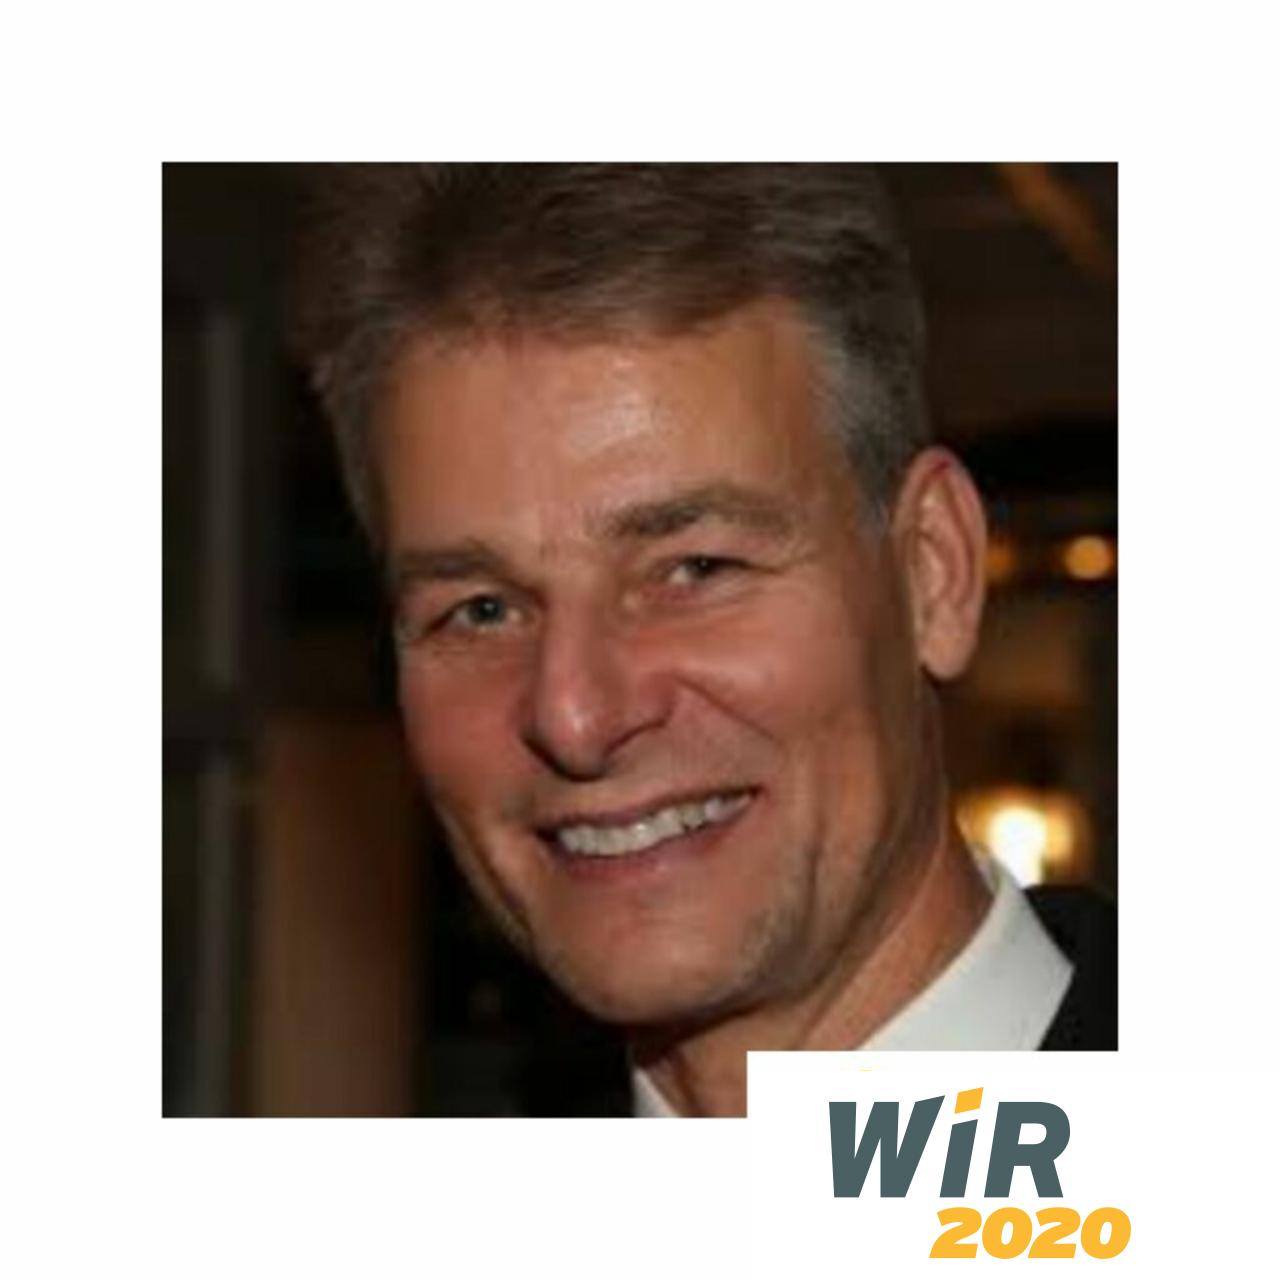 WolfgangRomberg-WiR2020